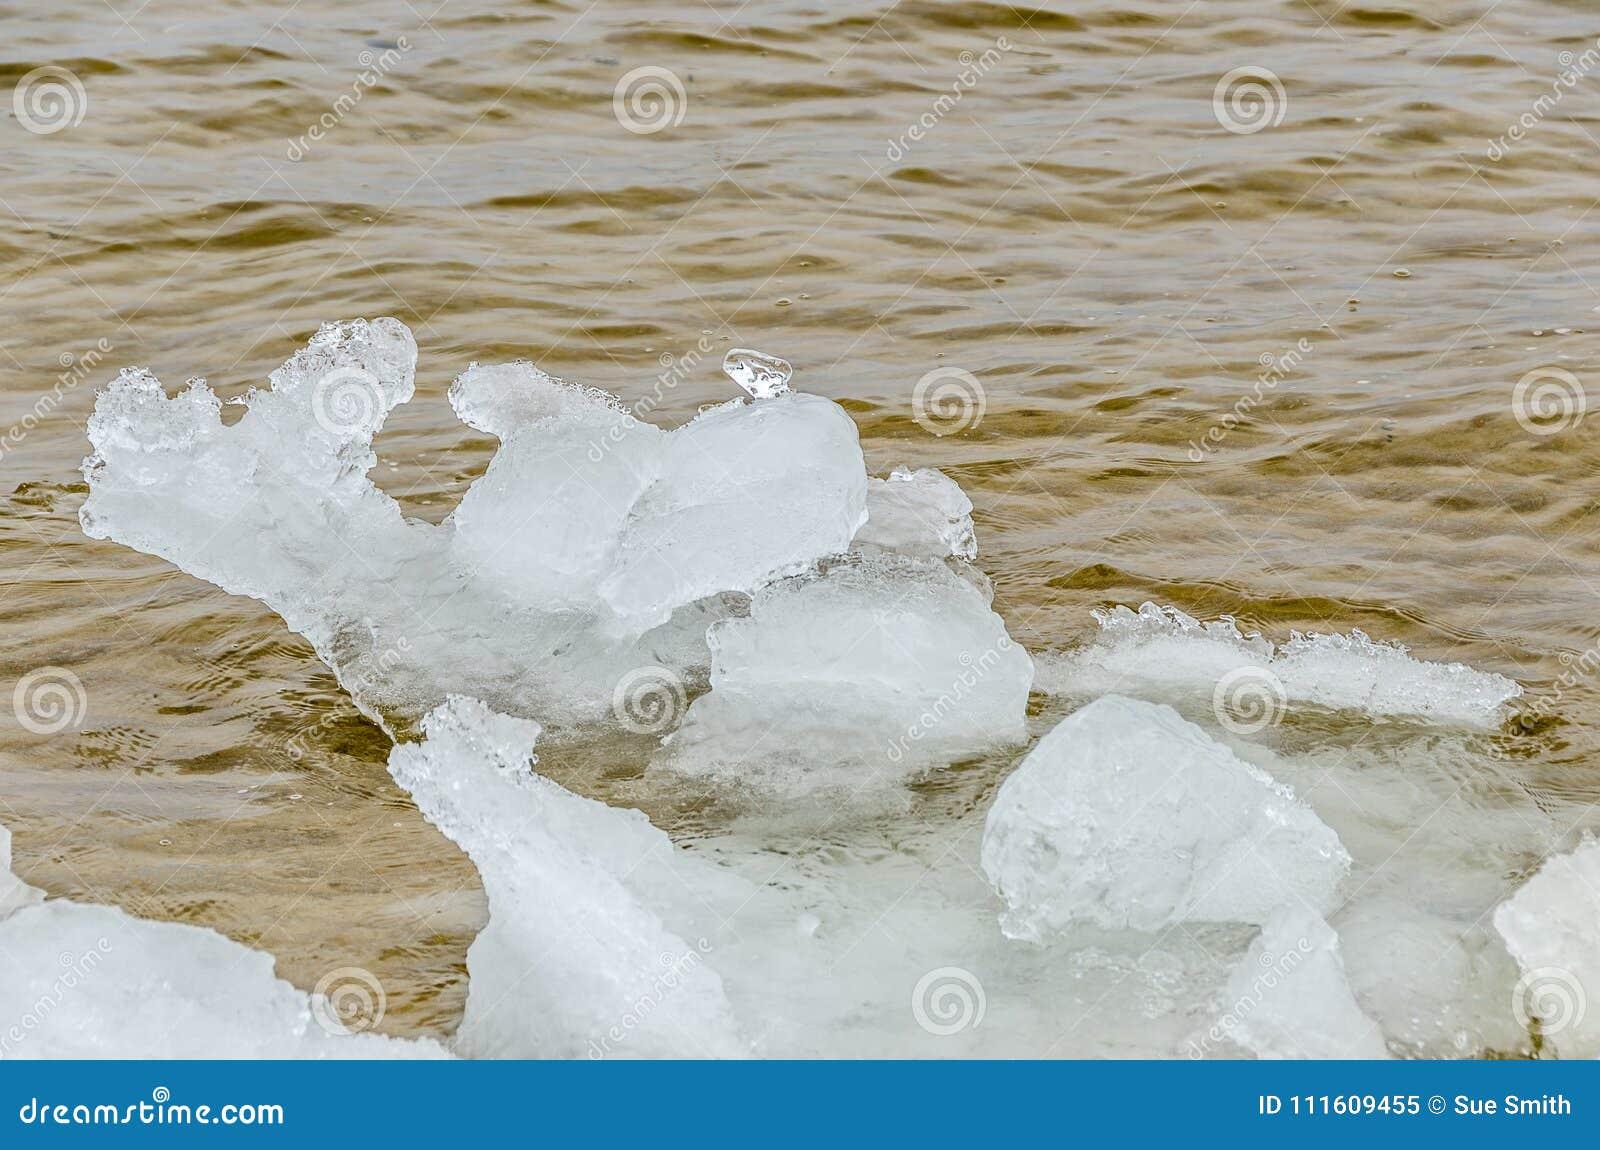 Crystal Clear Ice Jewel